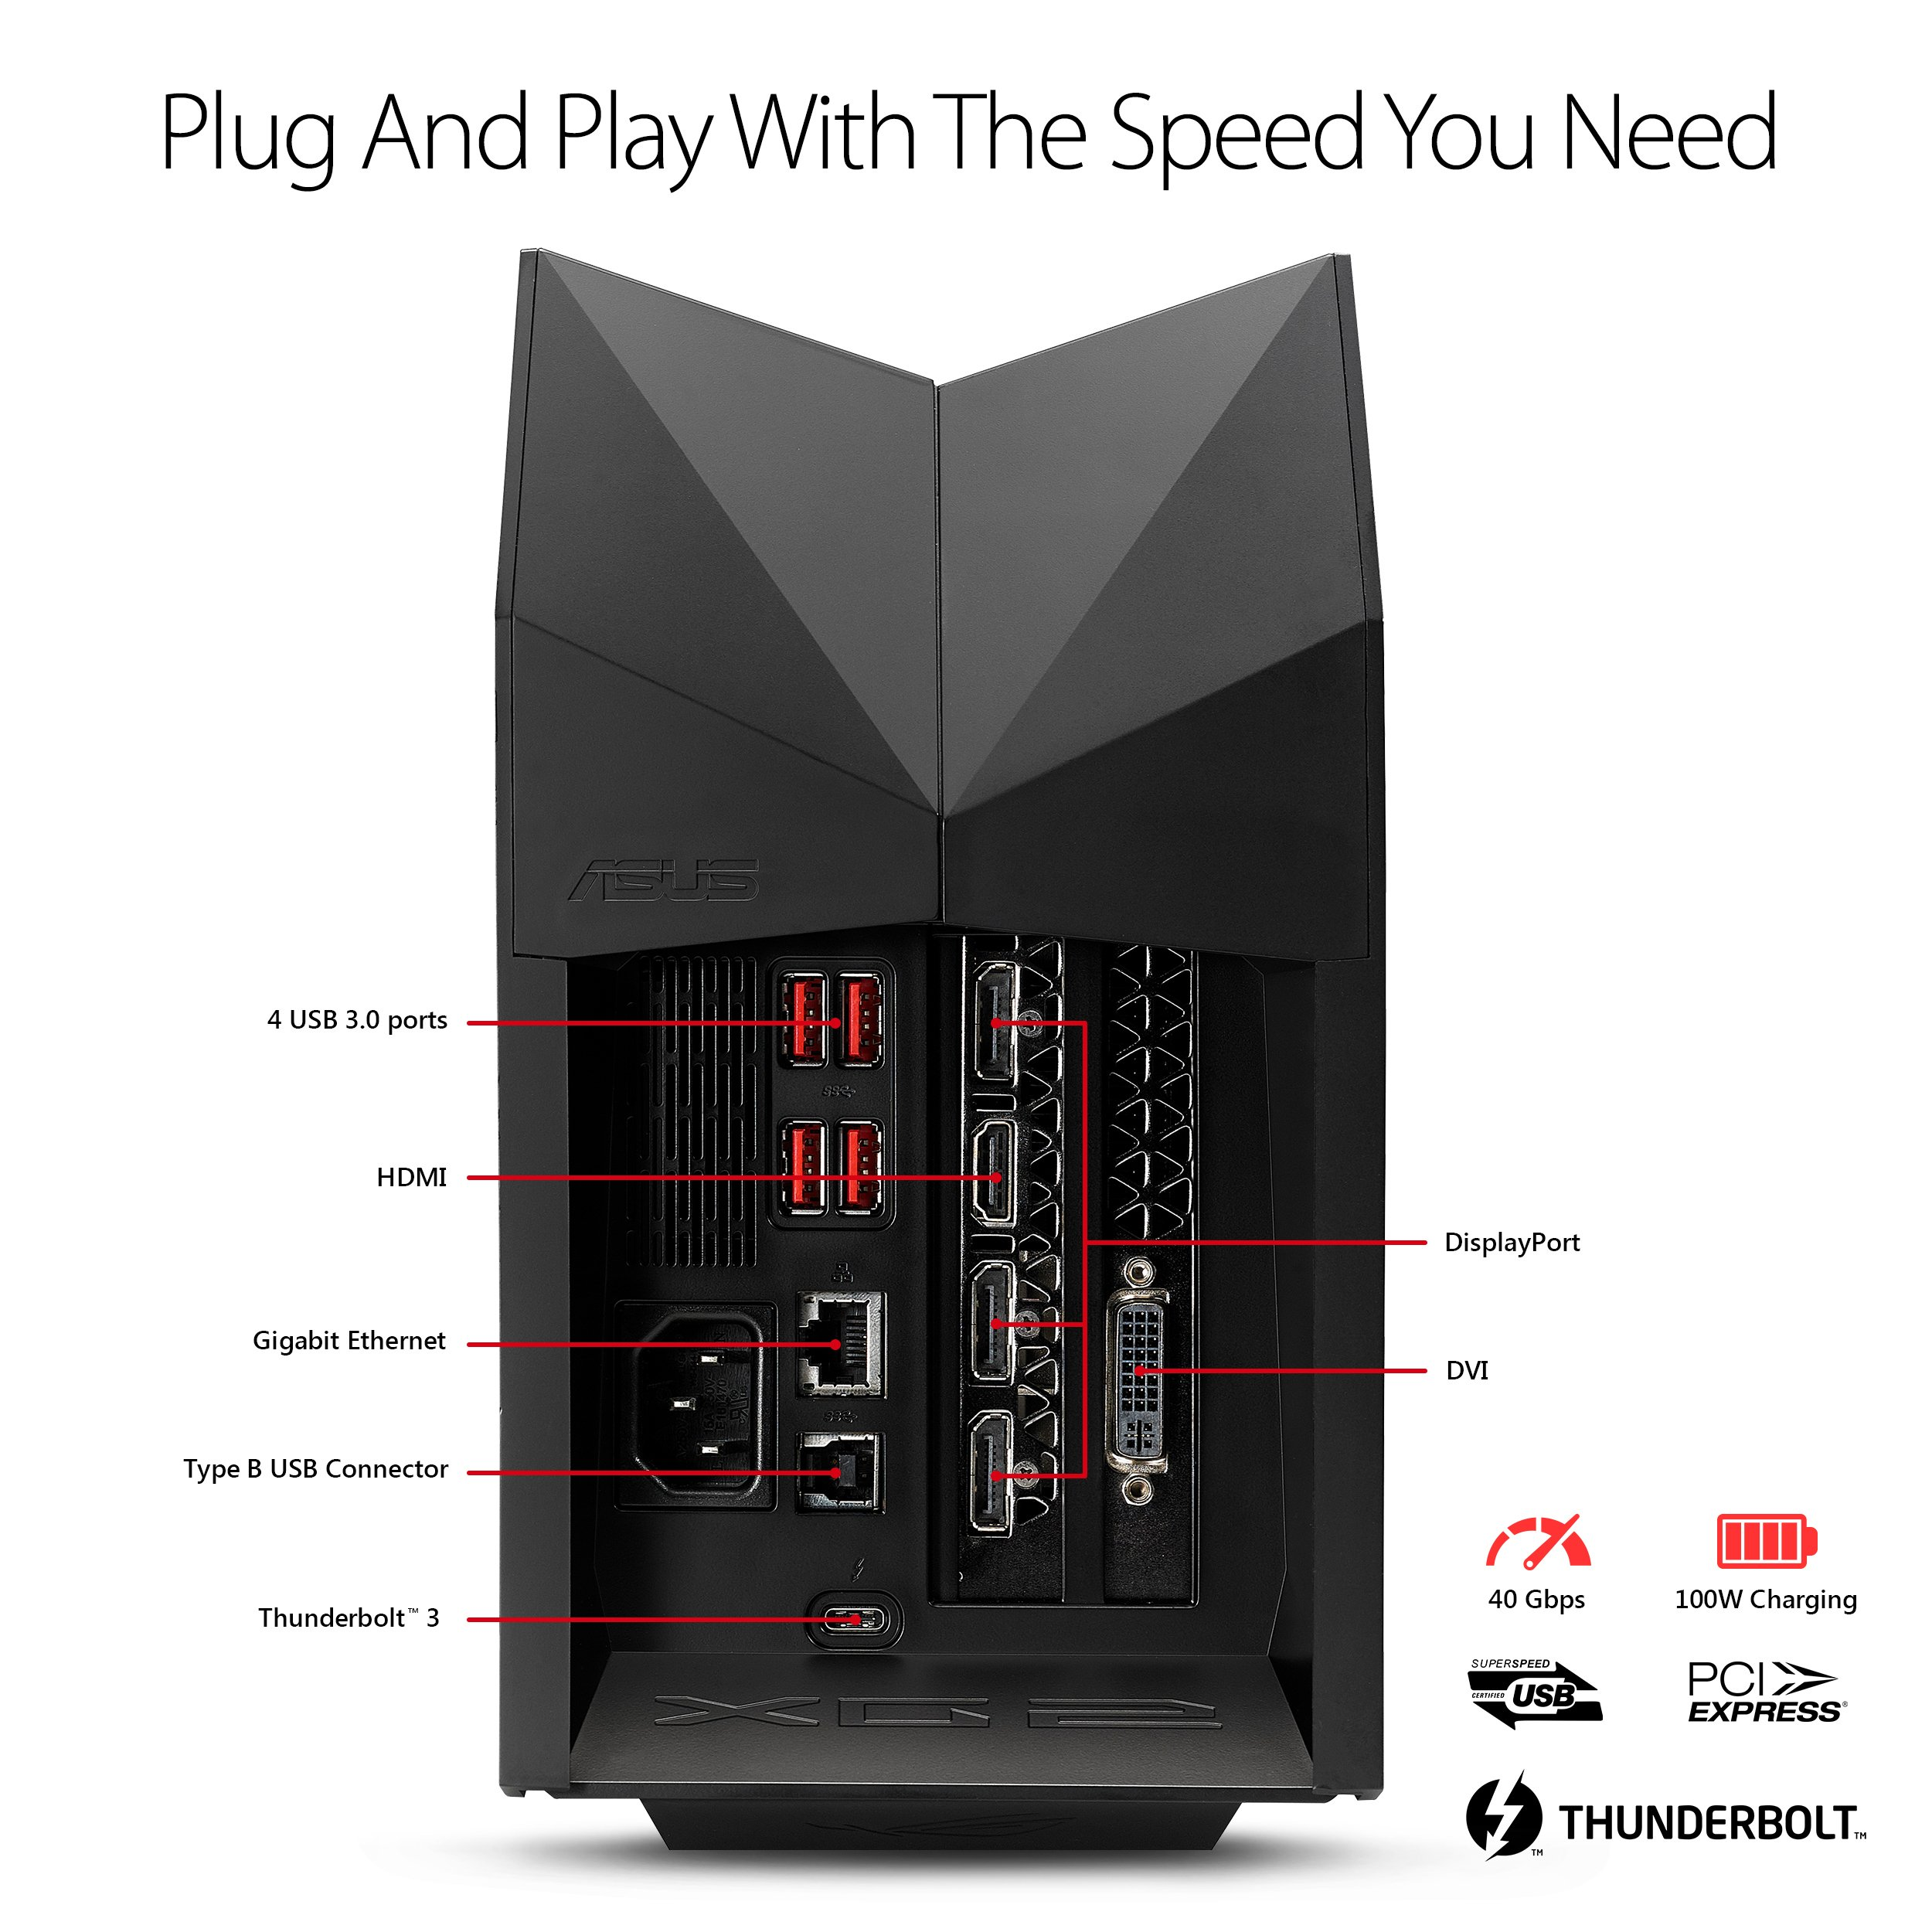 ASUS ROG-XG-STATION-2 2 Thunderbolt 3 USB 3.0 External Graphics Card Dock by Asus (Image #1)